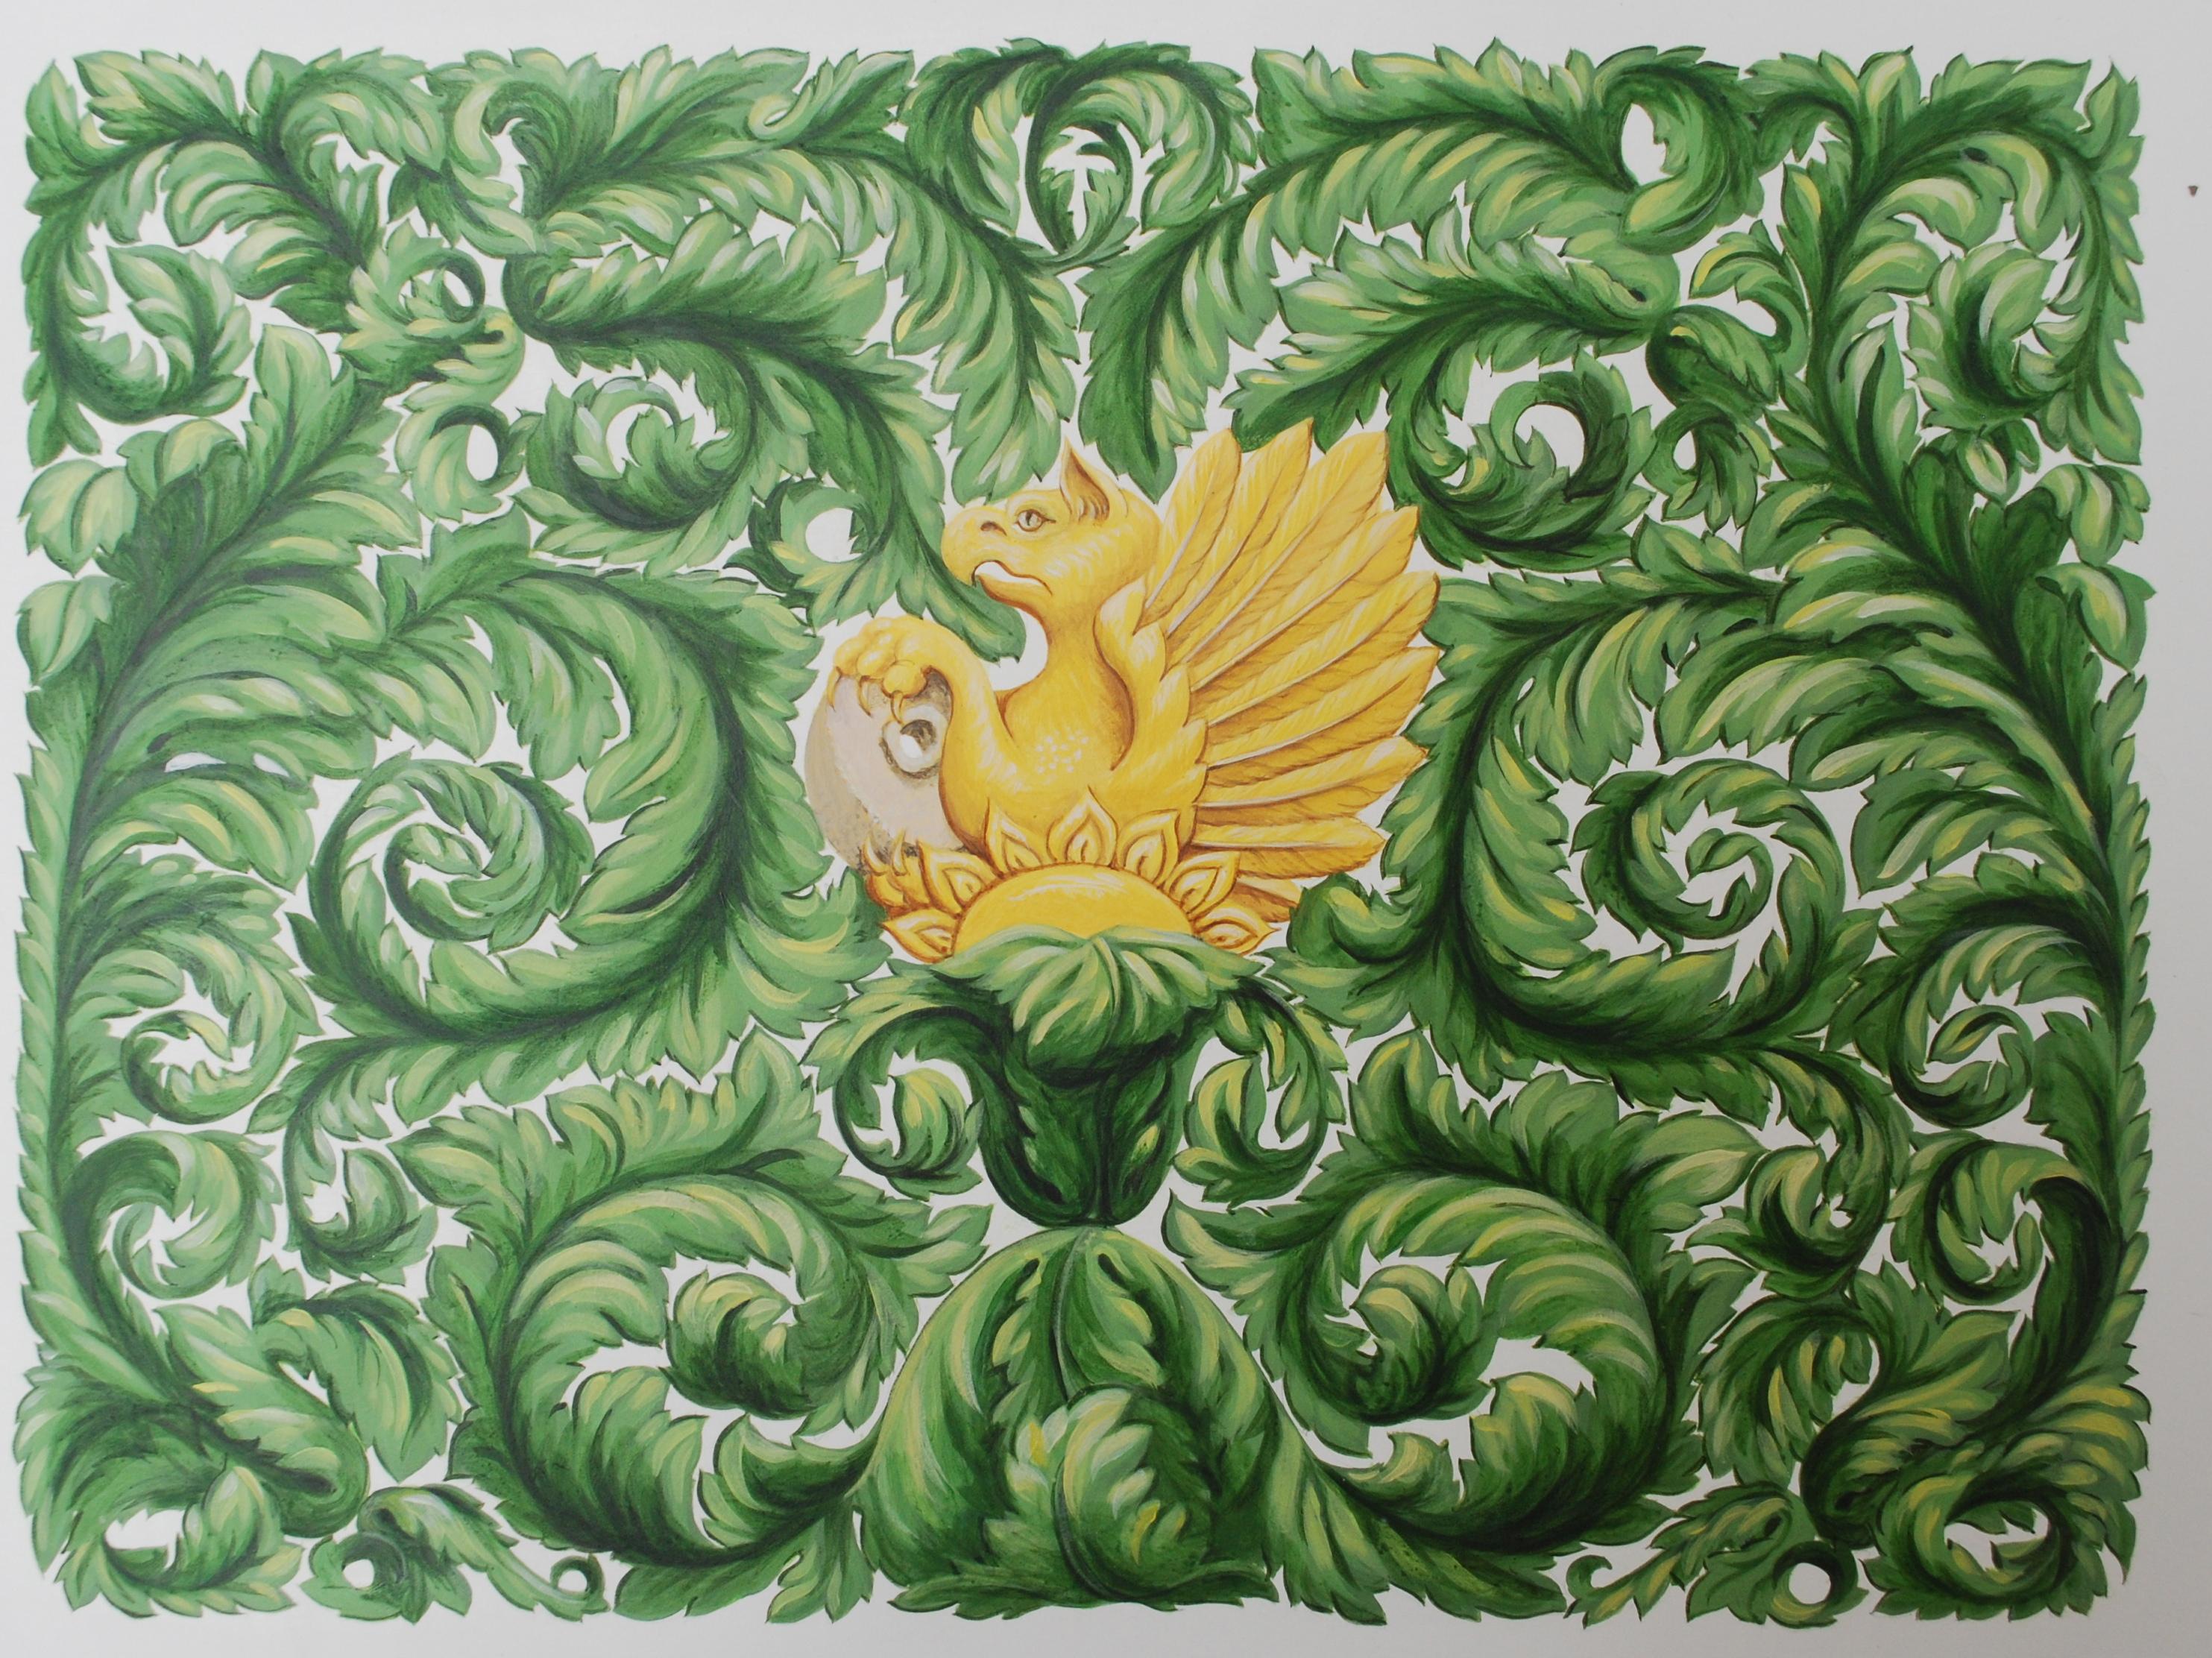 Dragon amongst the fern